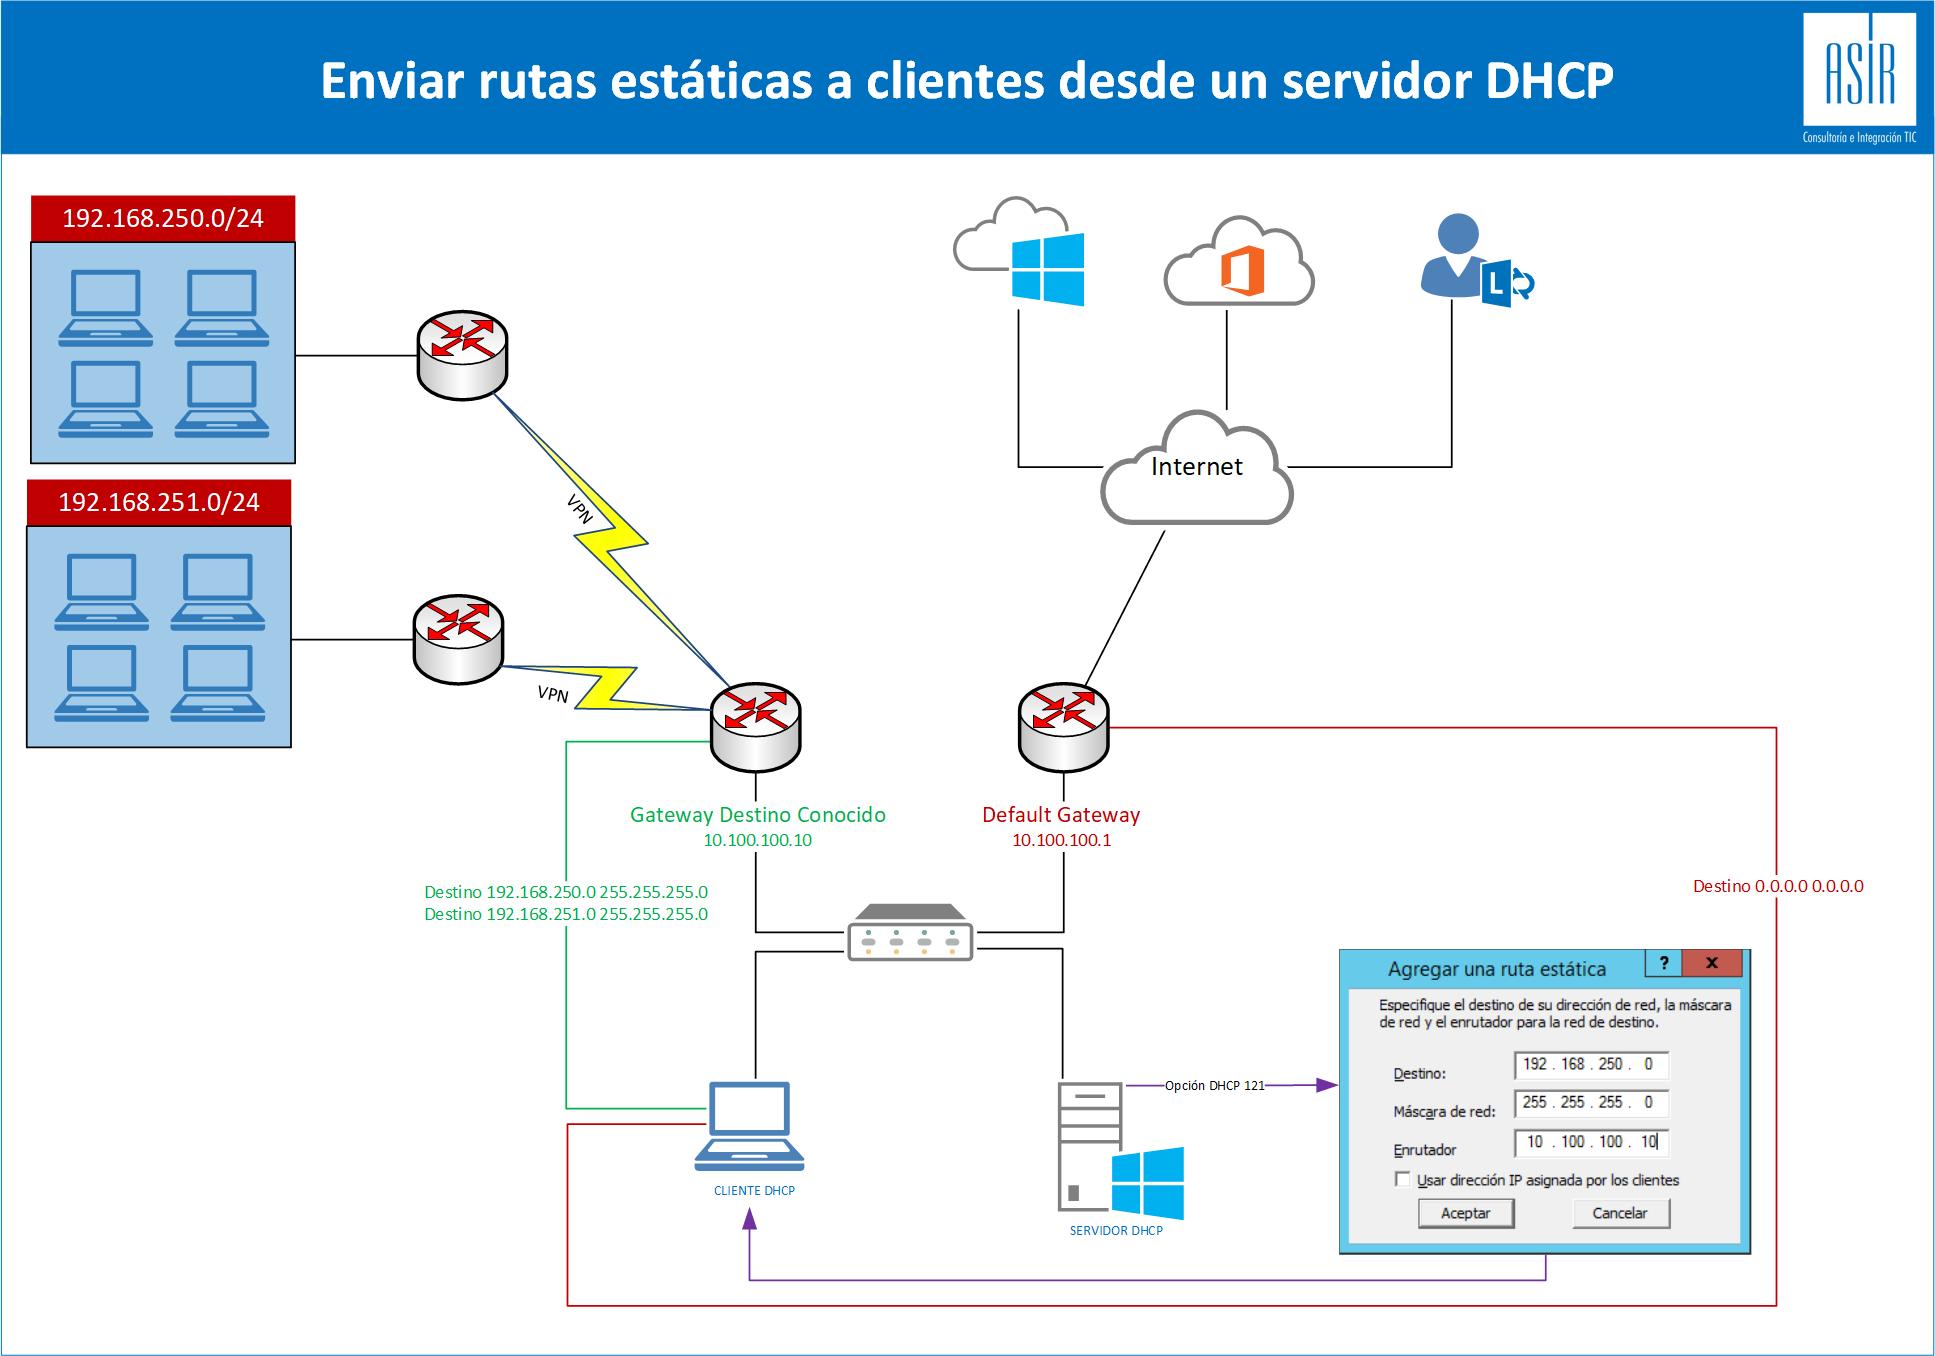 Rutas-Estaticas-DHCP.png